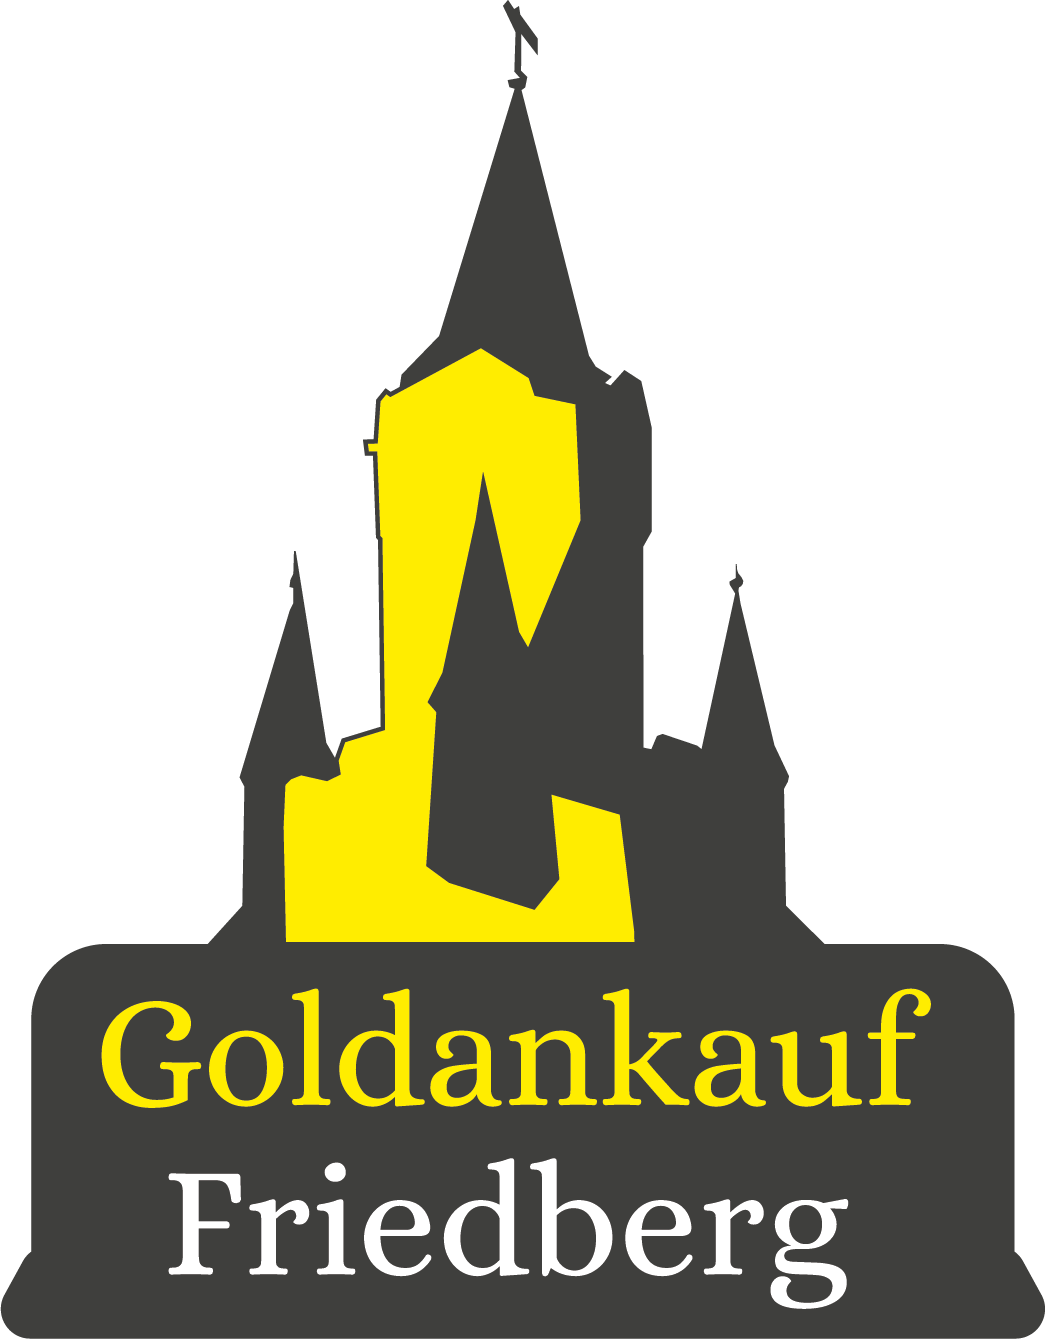 Goldankauf Friedberg